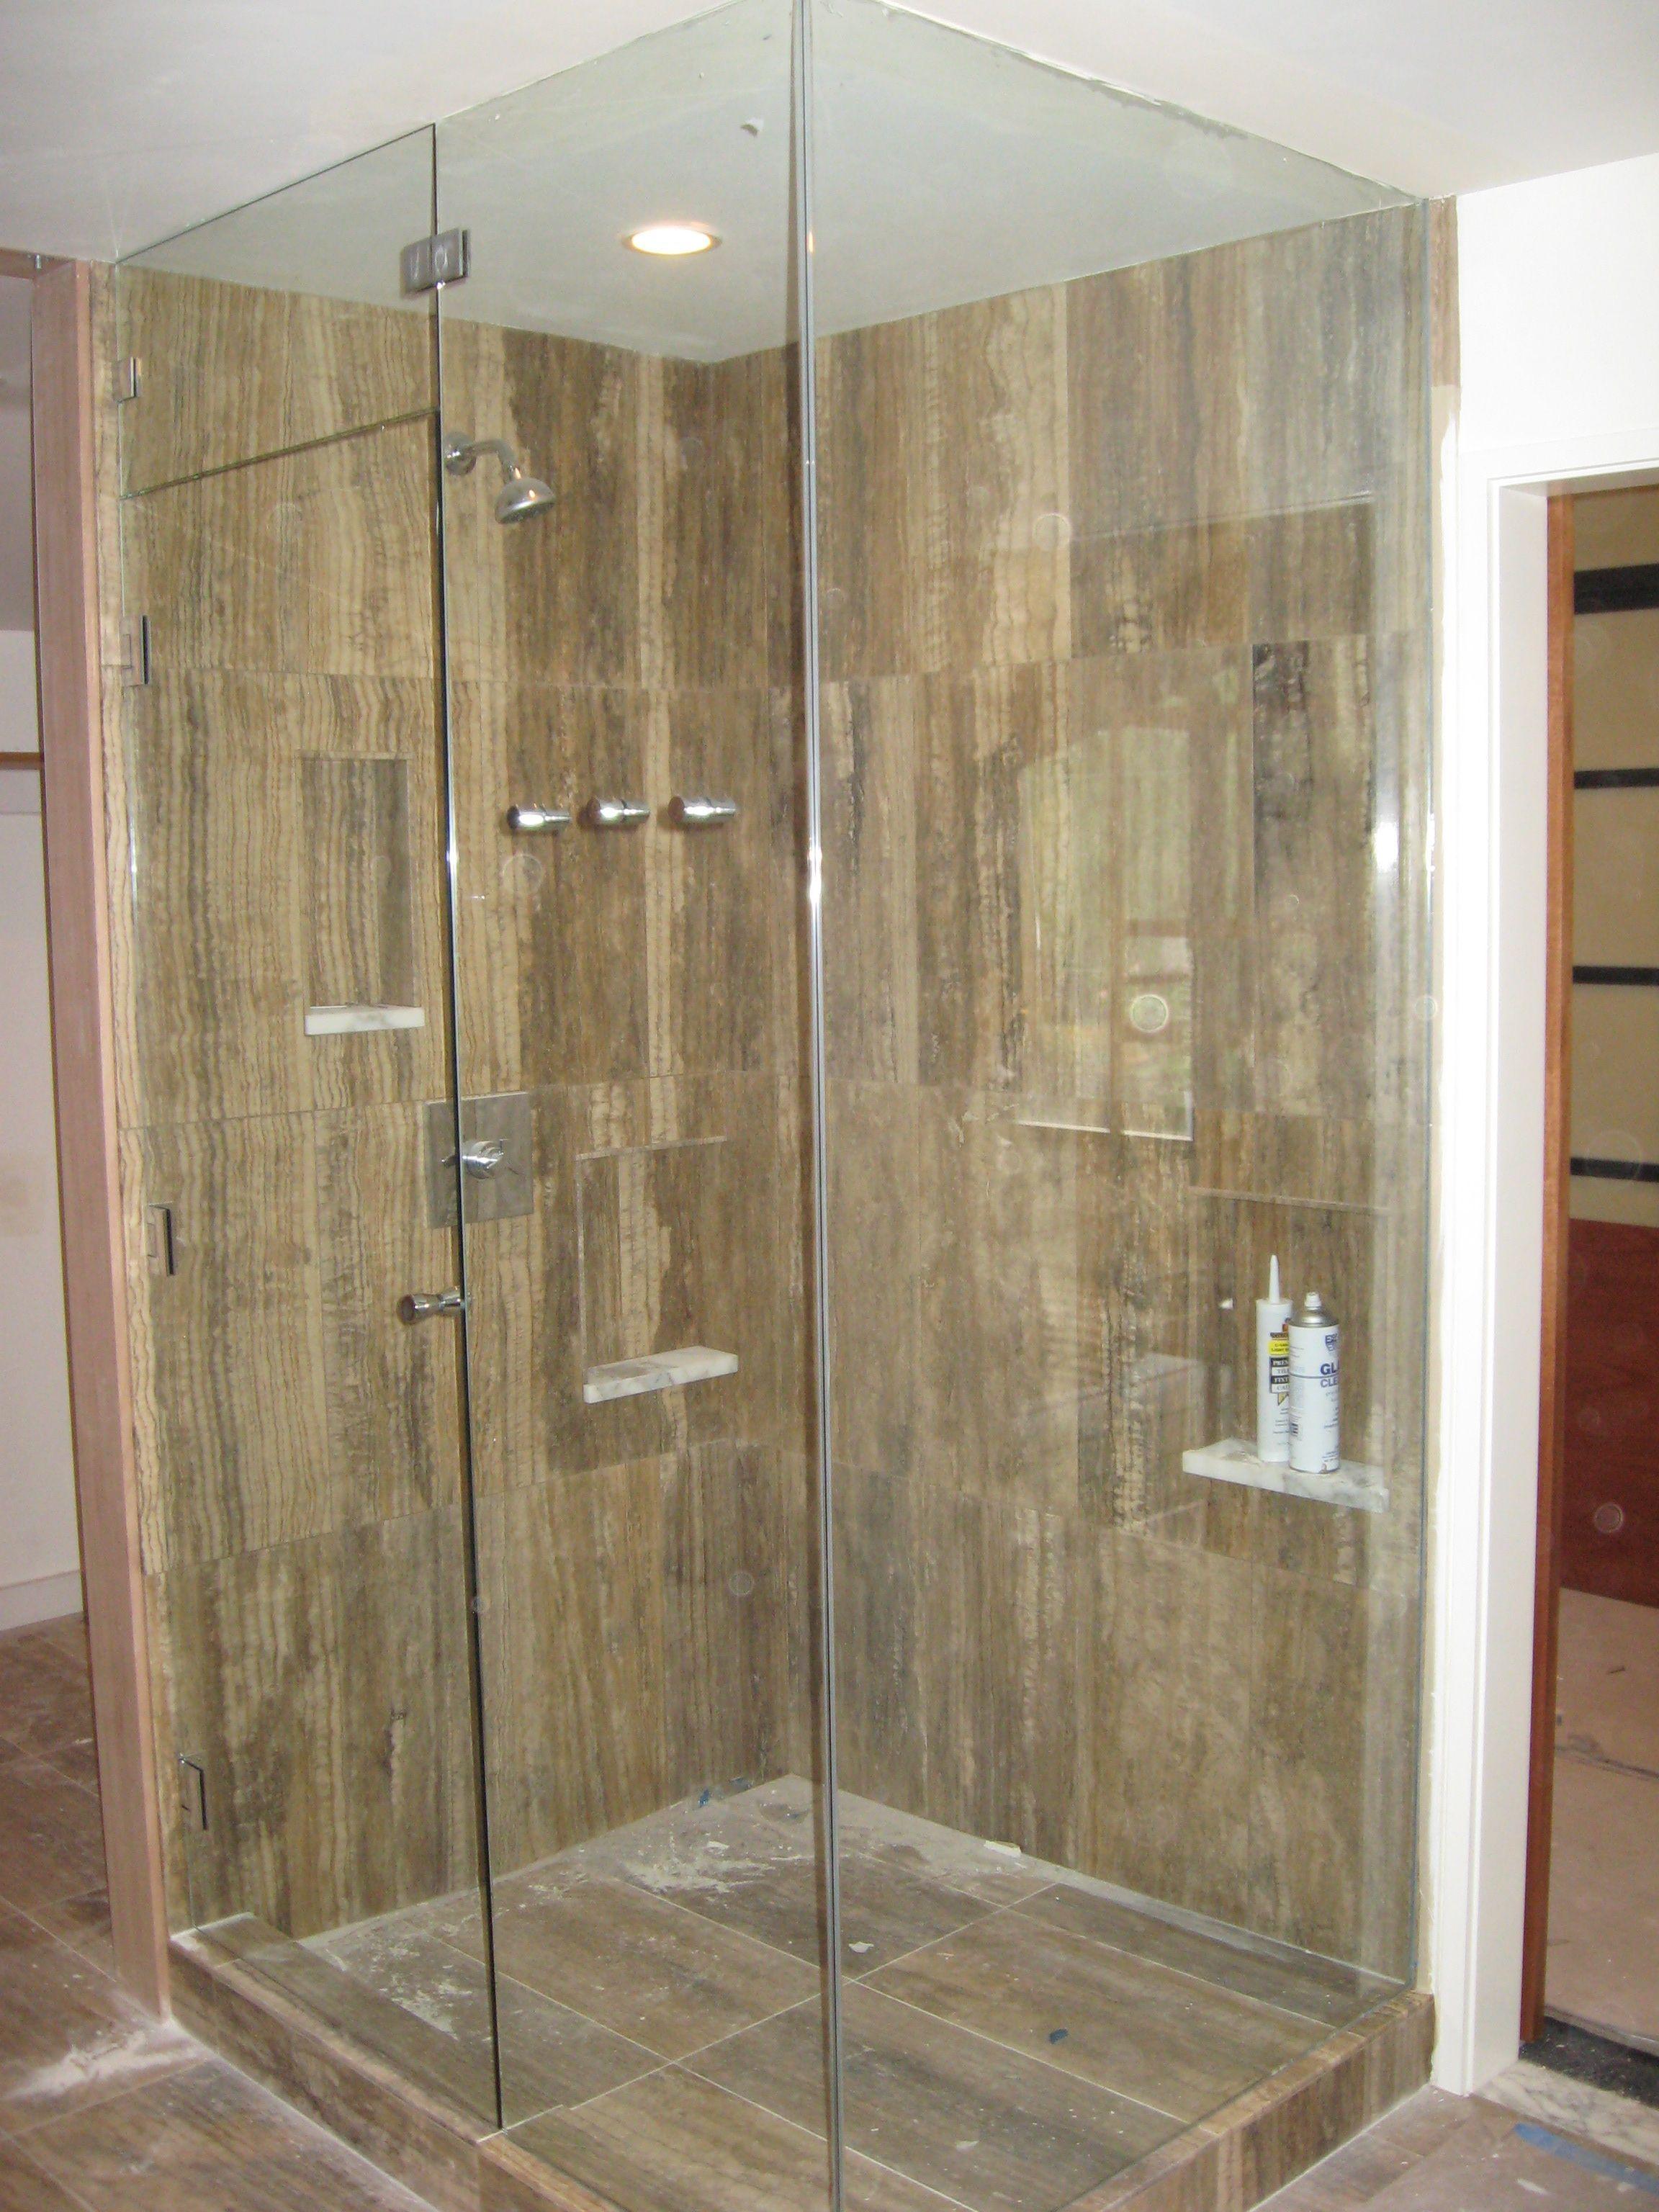 3 Panel Sliding Shower Door With Mirror | Bath | Pinterest | Shower ...